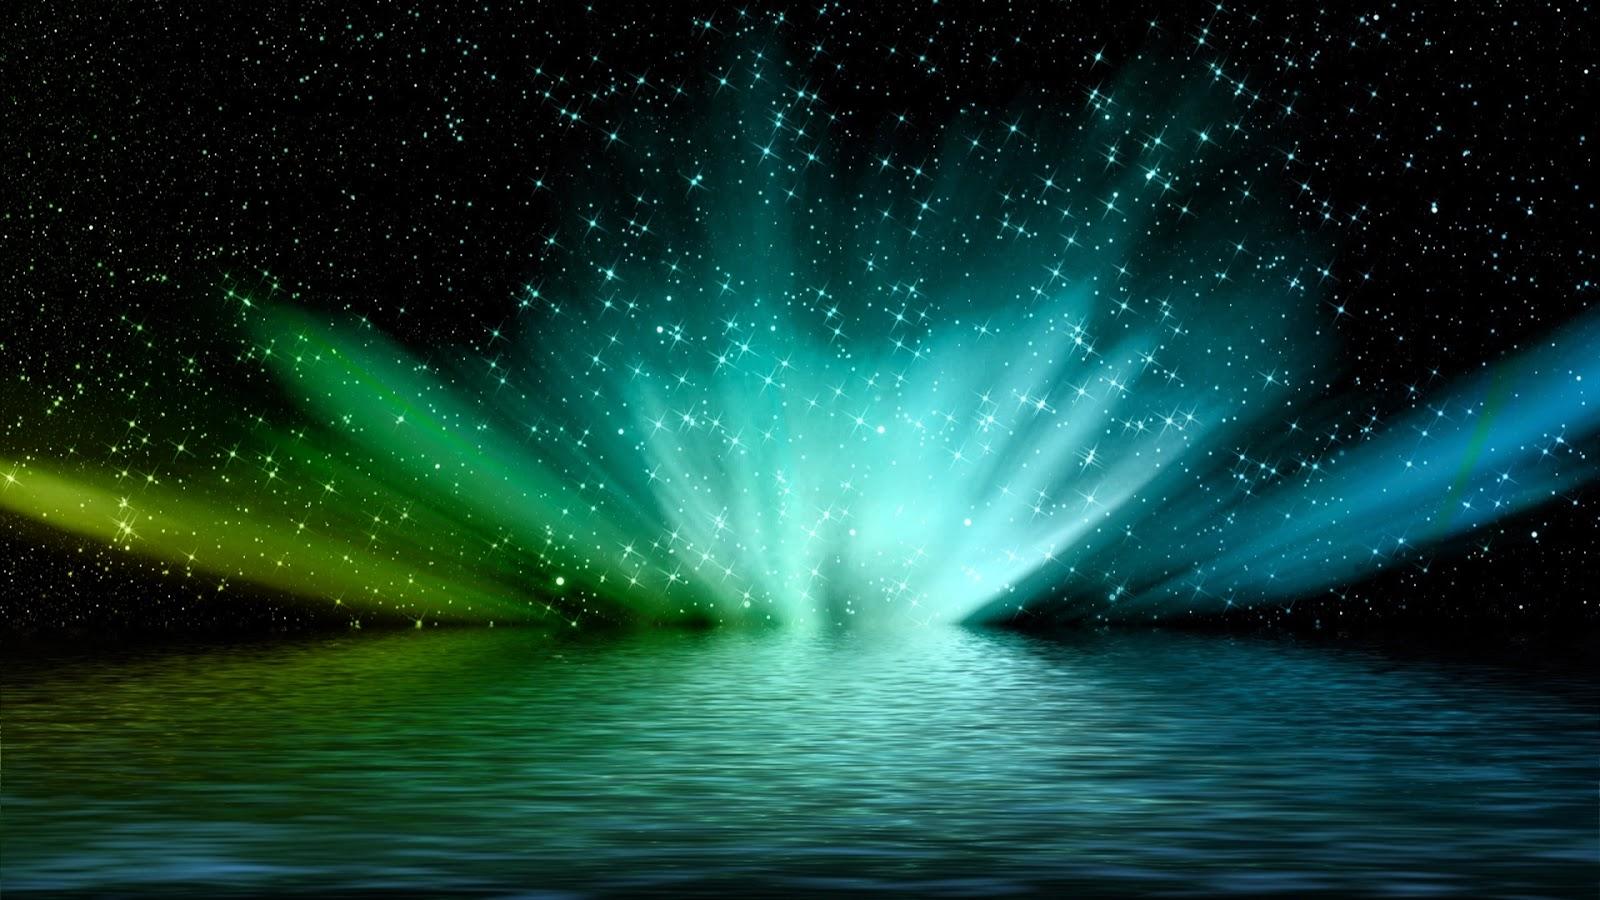 1080 wallpaper hd: aurora borealis wallpaper free download